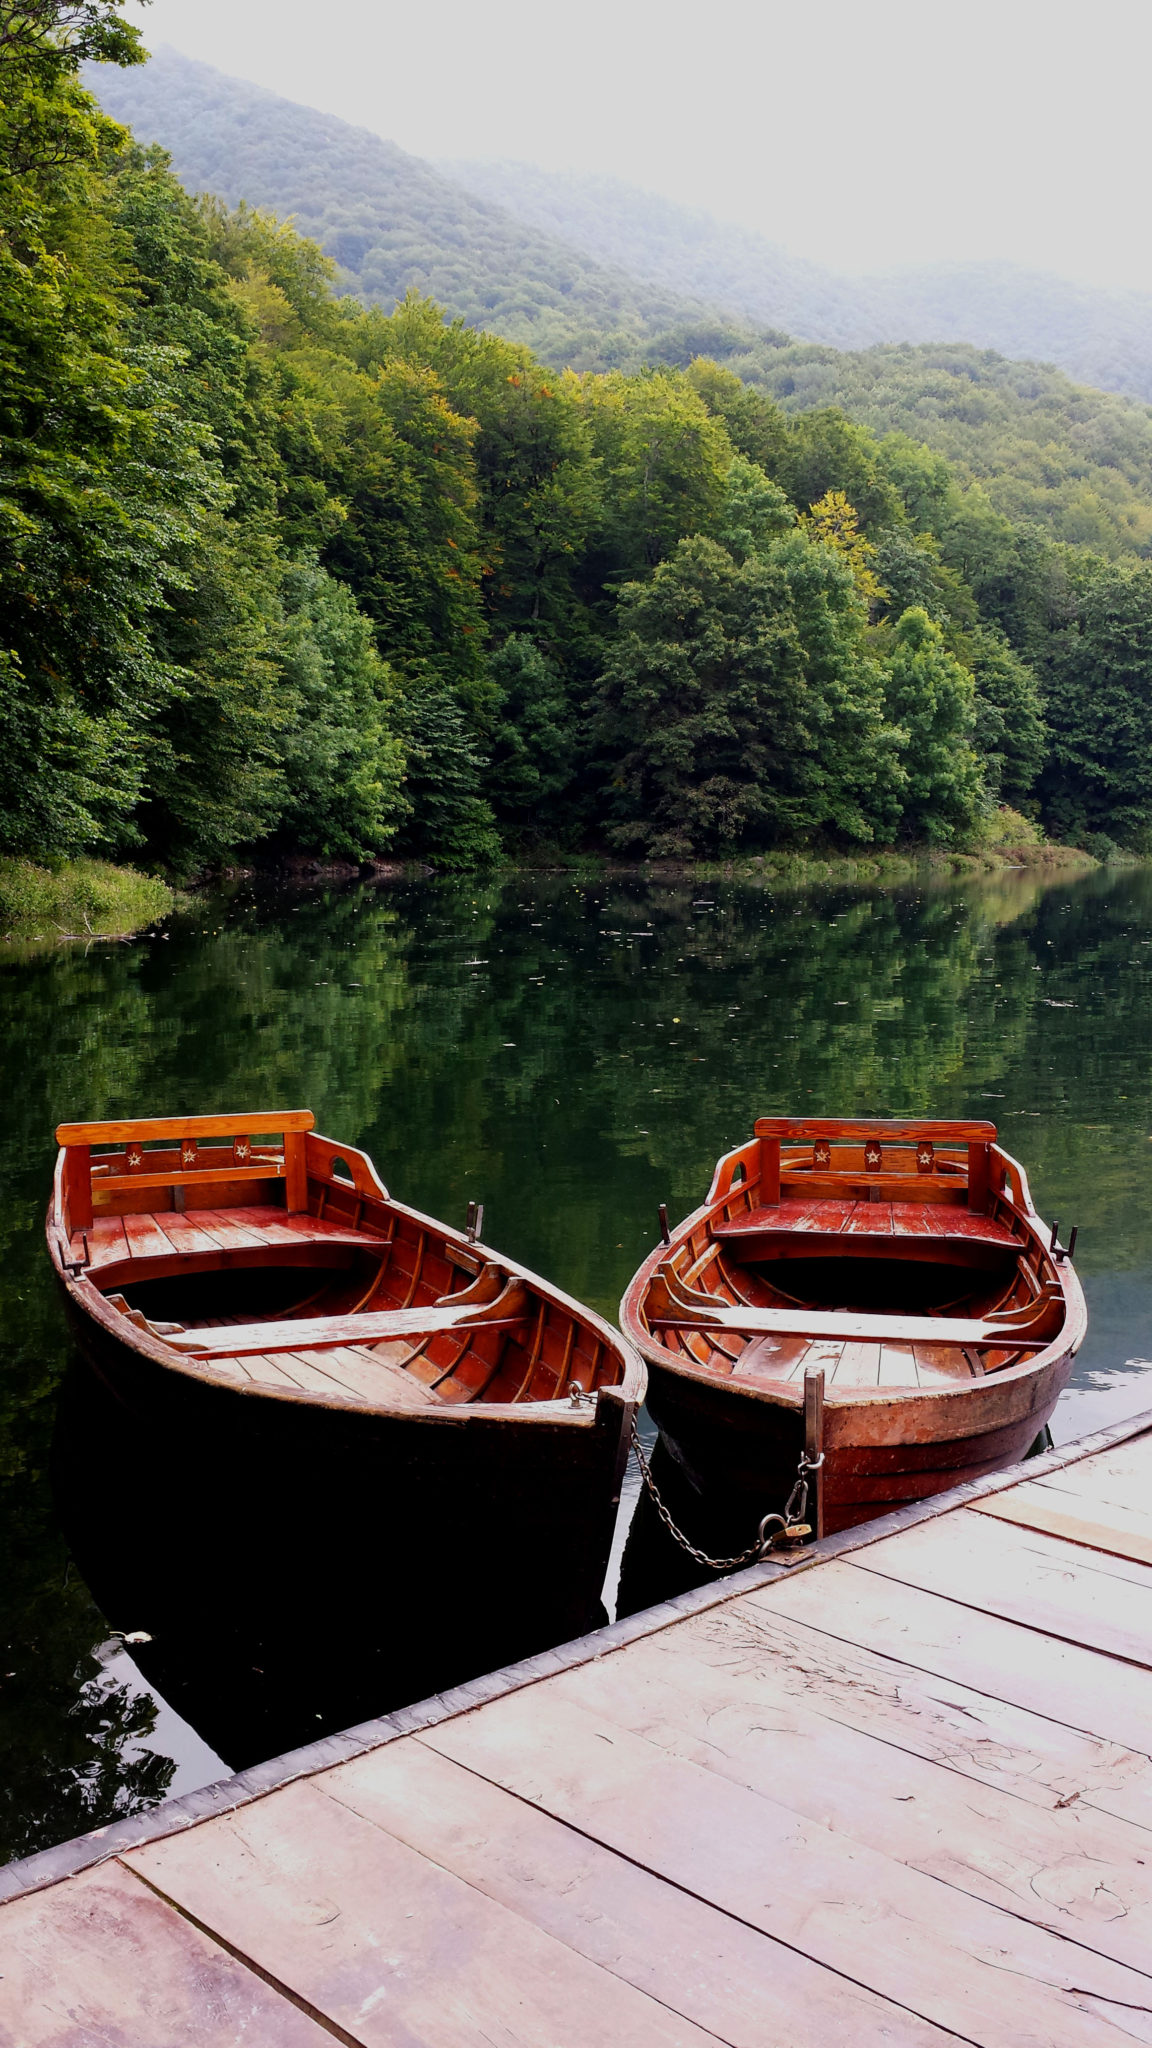 Hema_Montenegro_parc_national_biogradska_gora_forest_travel_voyage_blog1